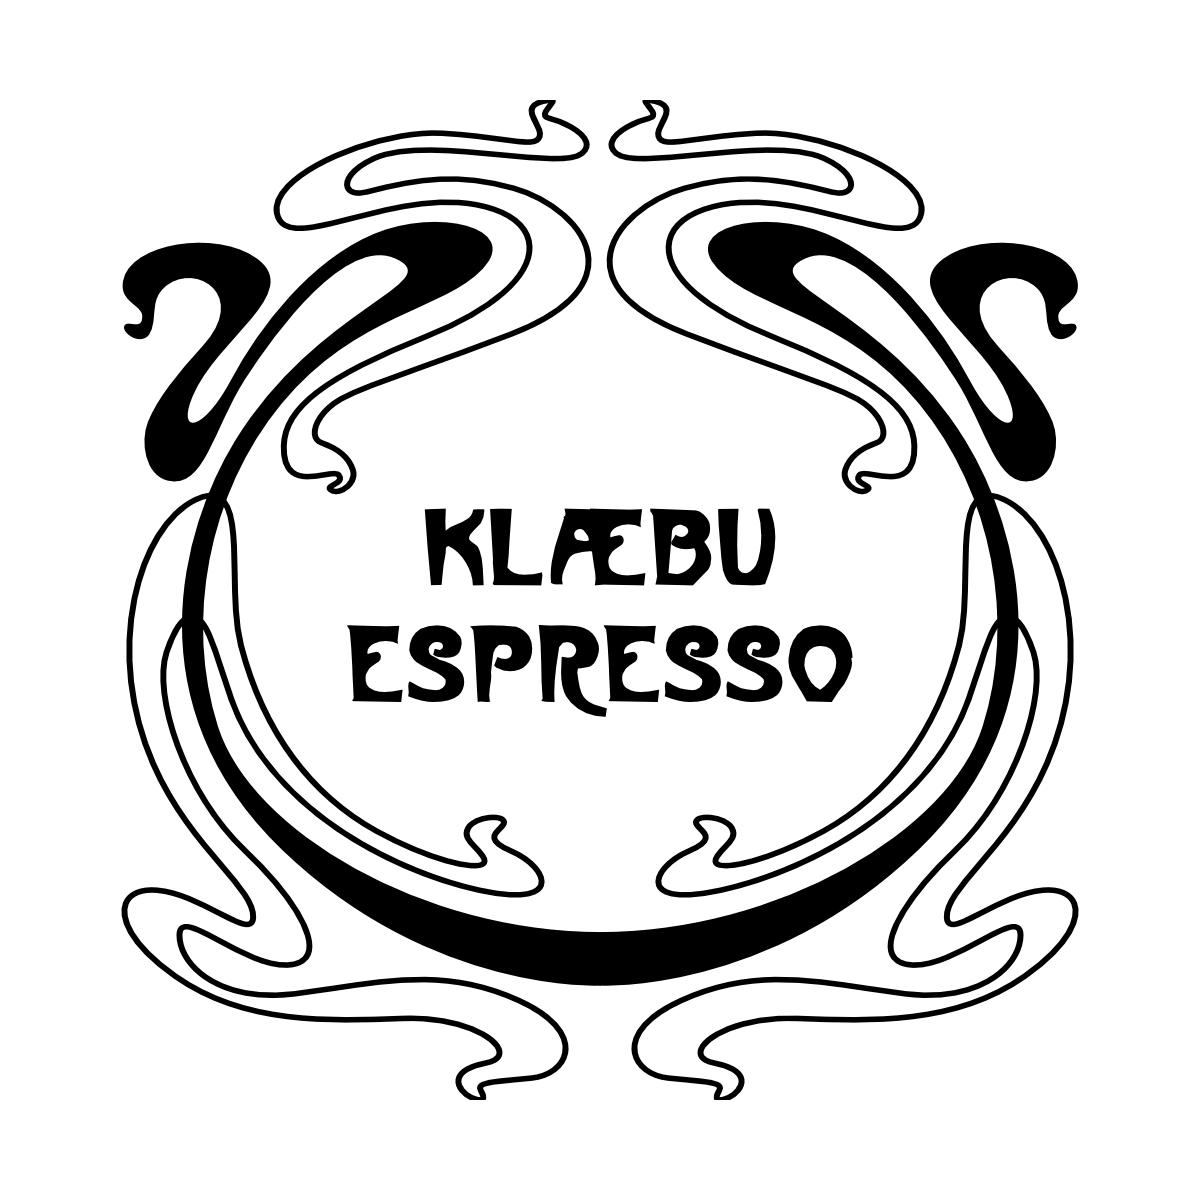 Klæbu Espresso